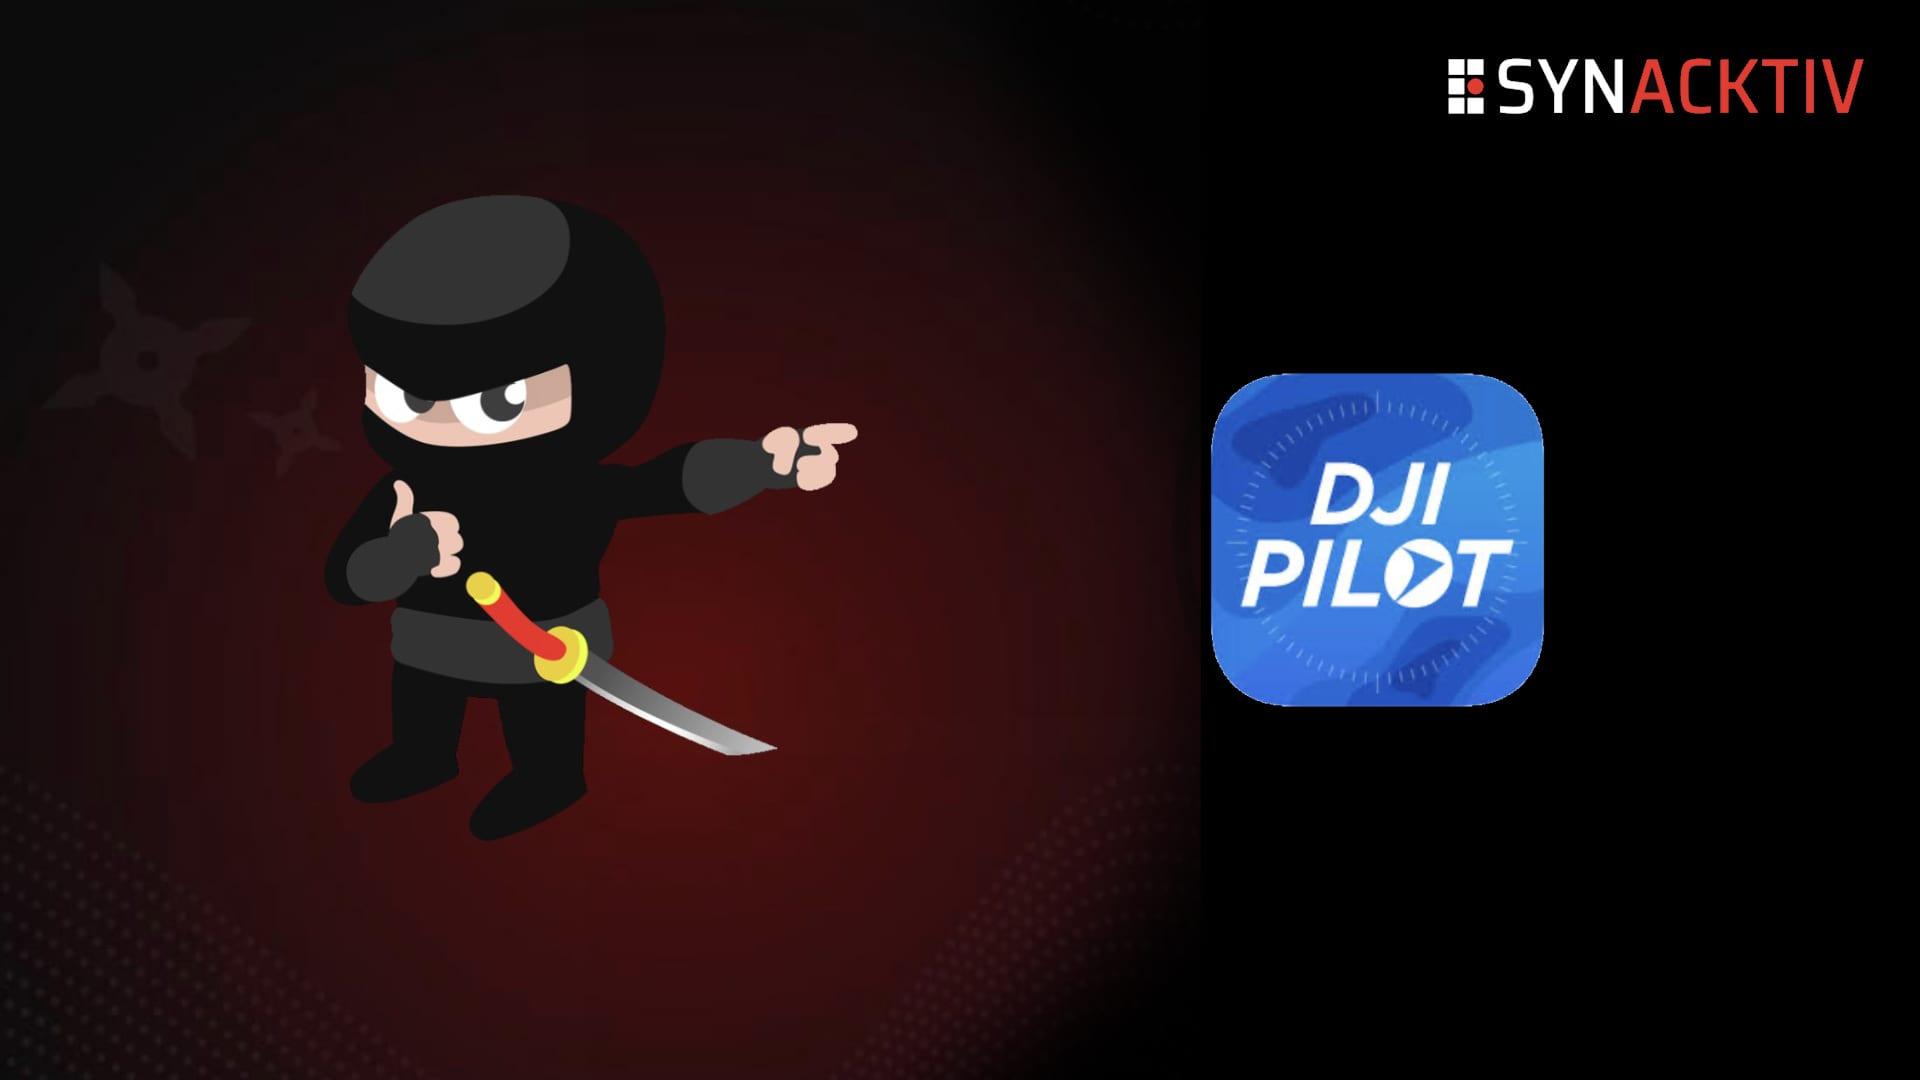 DJI Pilot app shares same security flaws as DJI Go 4, according to Synacktiv